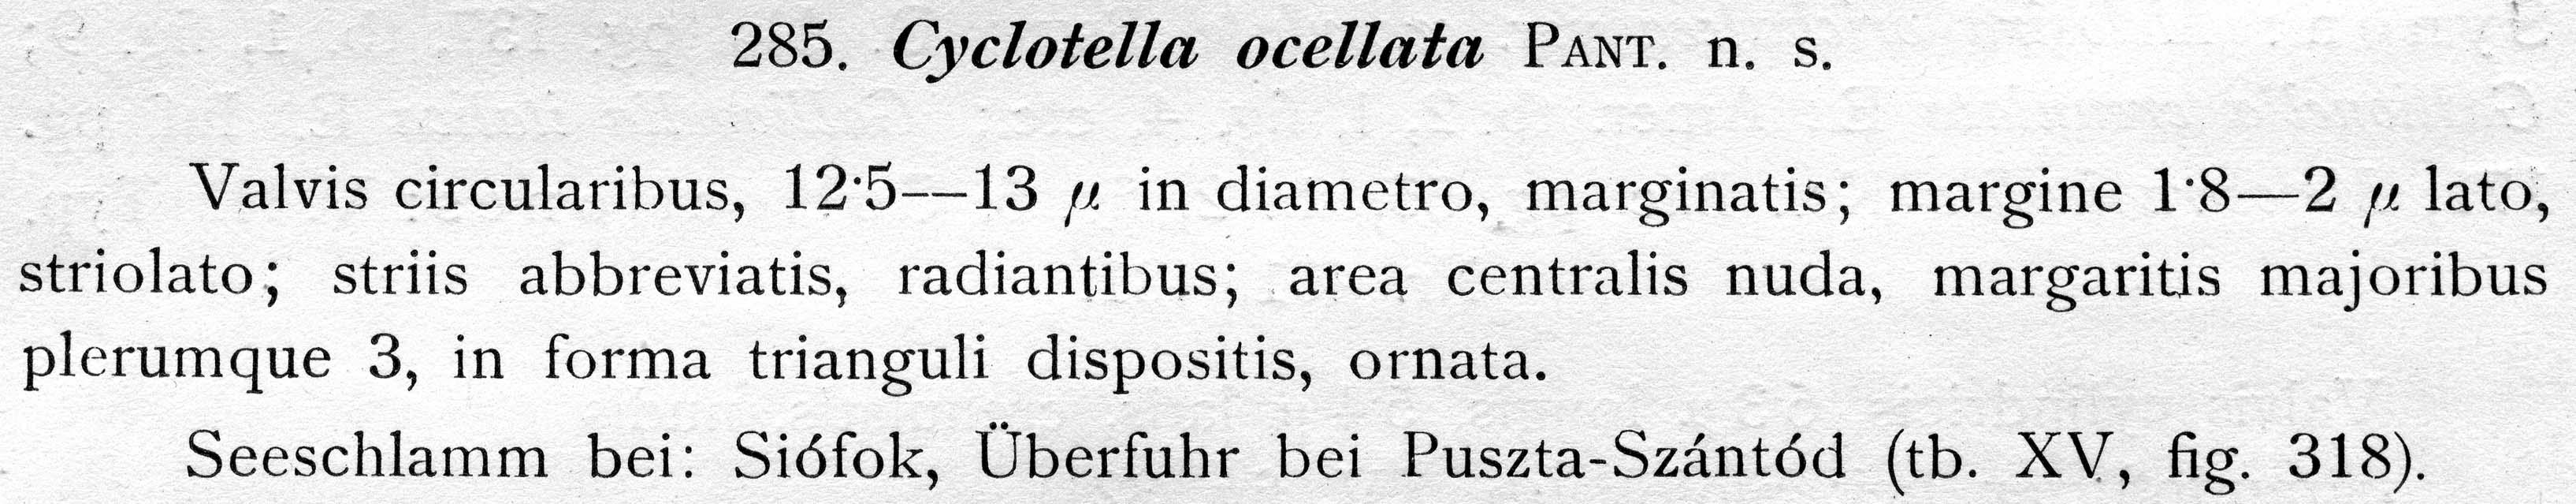 Cyclotella ocellata orig descr